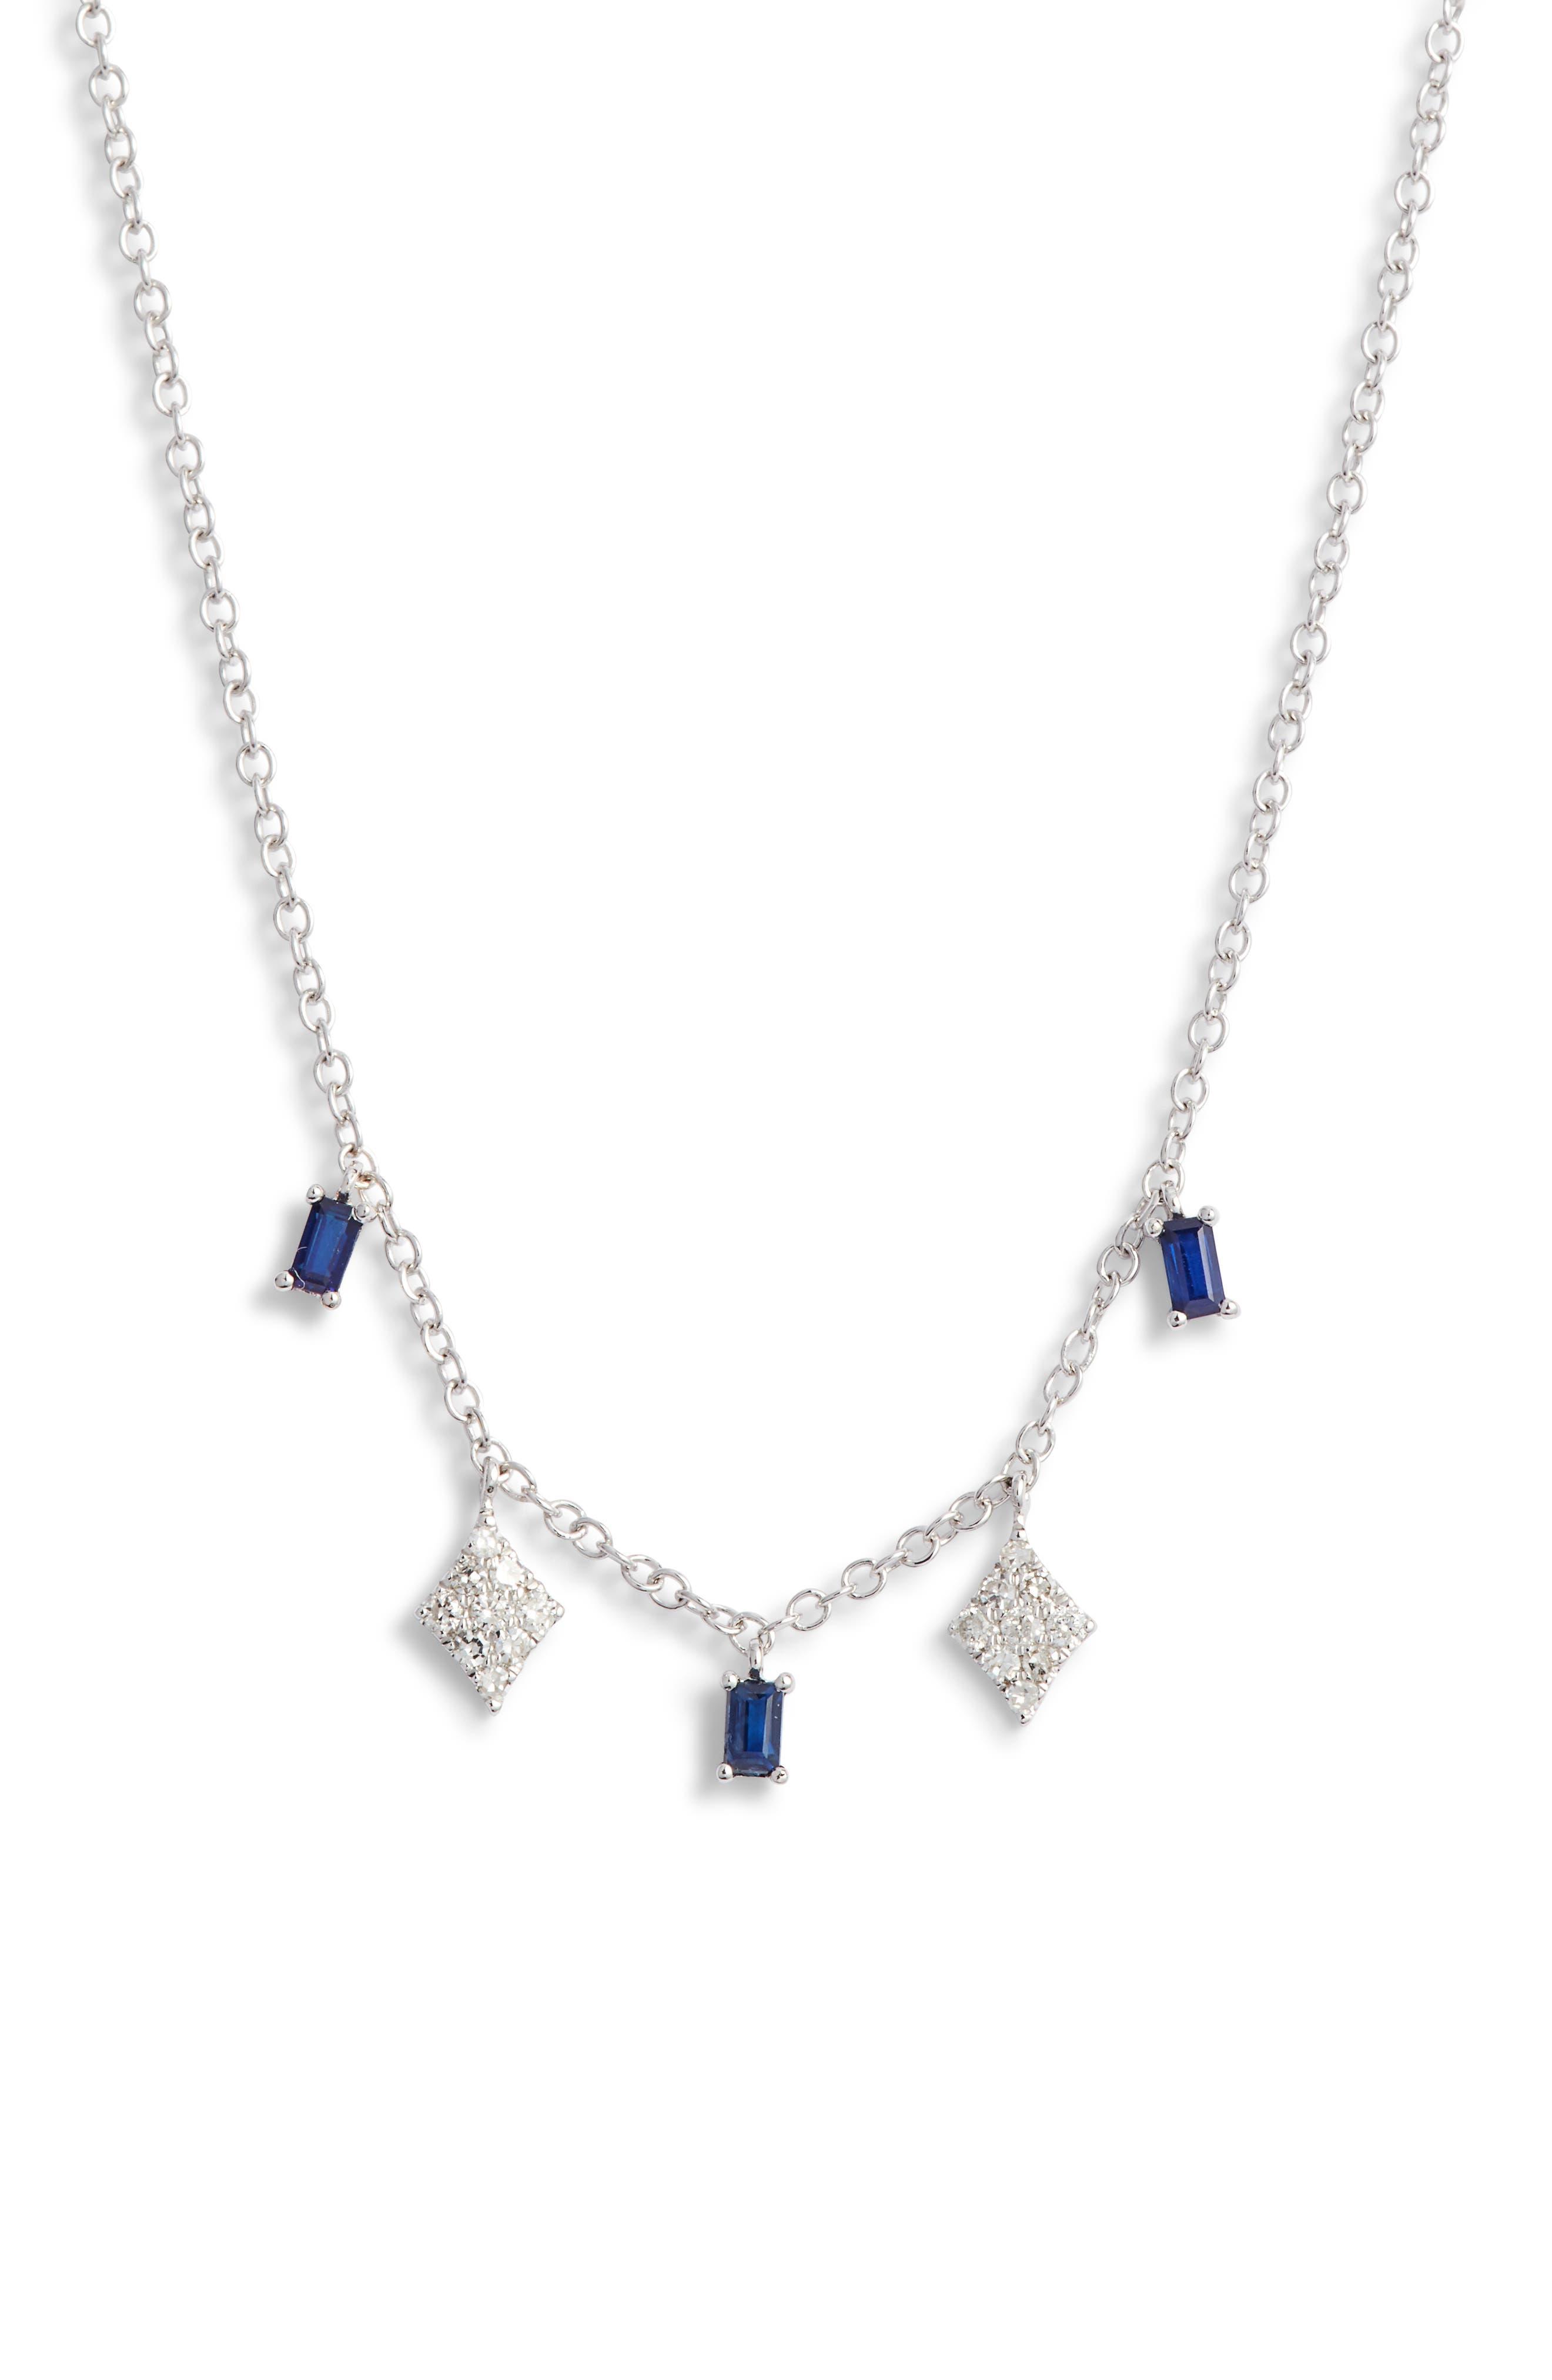 MEIRA T Sapphire & Diamond Charm Necklace in White Gold/ Diamond/ Sapphire